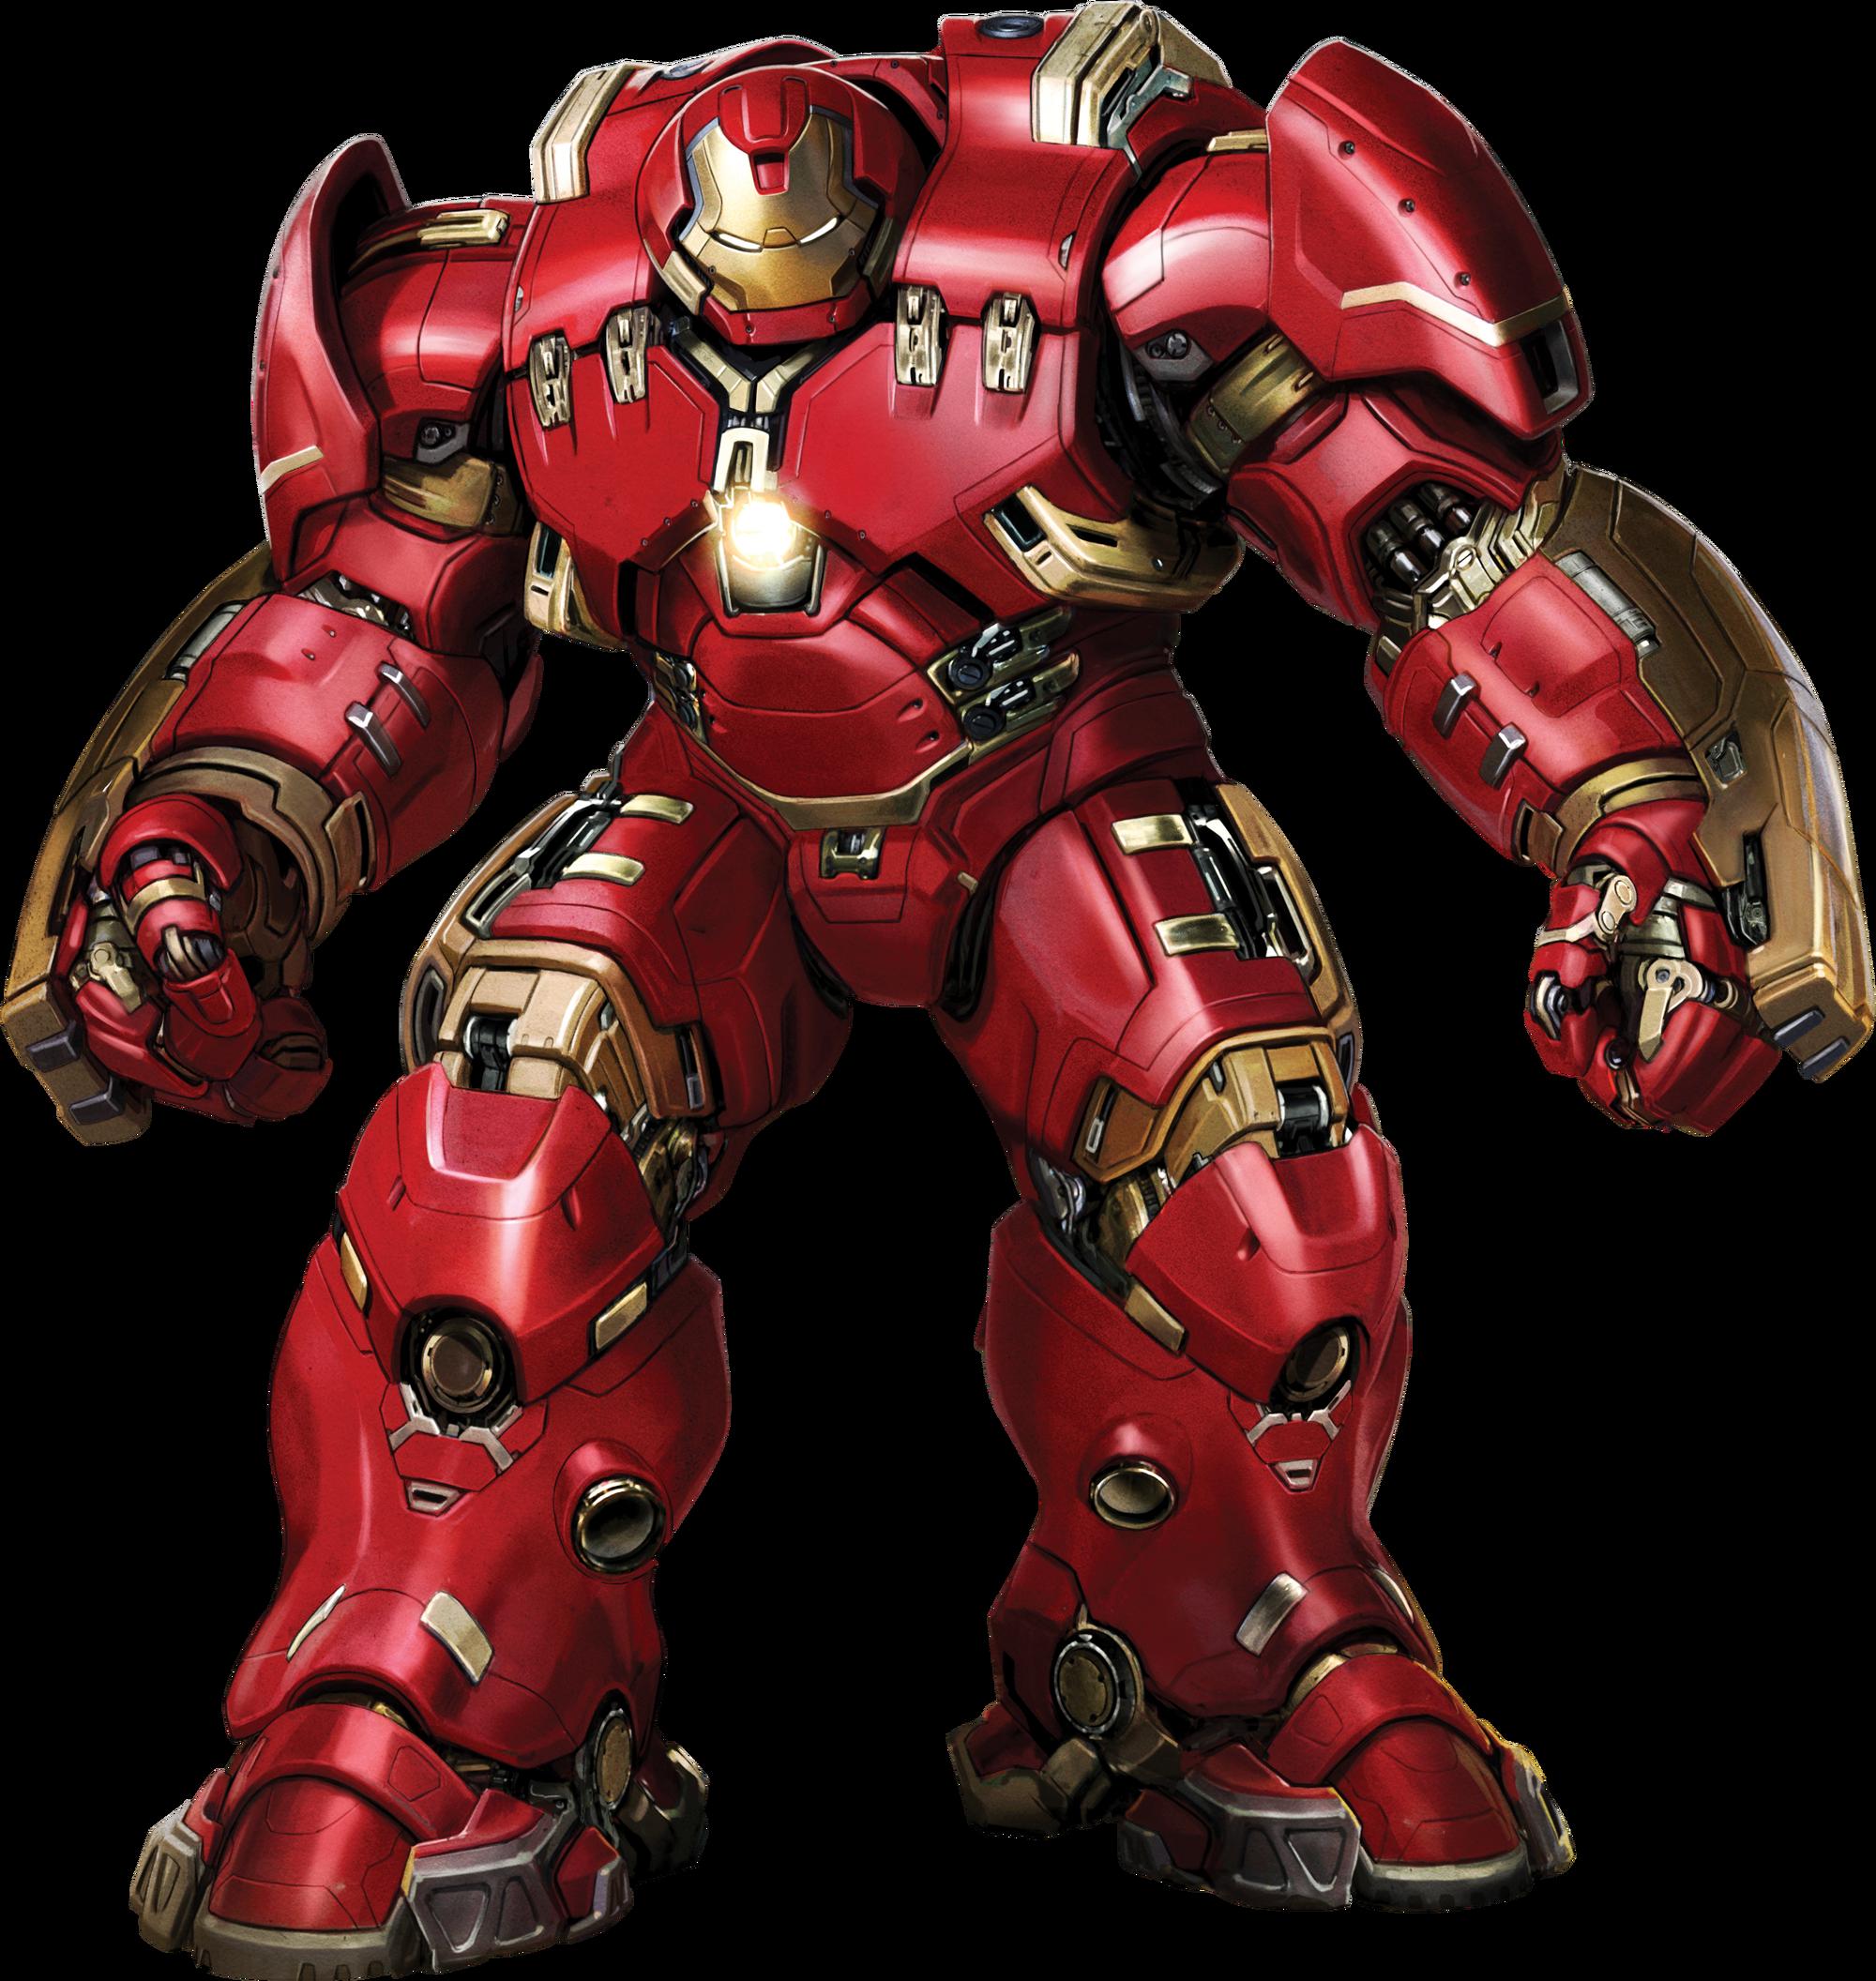 Iron Man Armor Mark XLIV Marvel Cinematic Universe Wiki